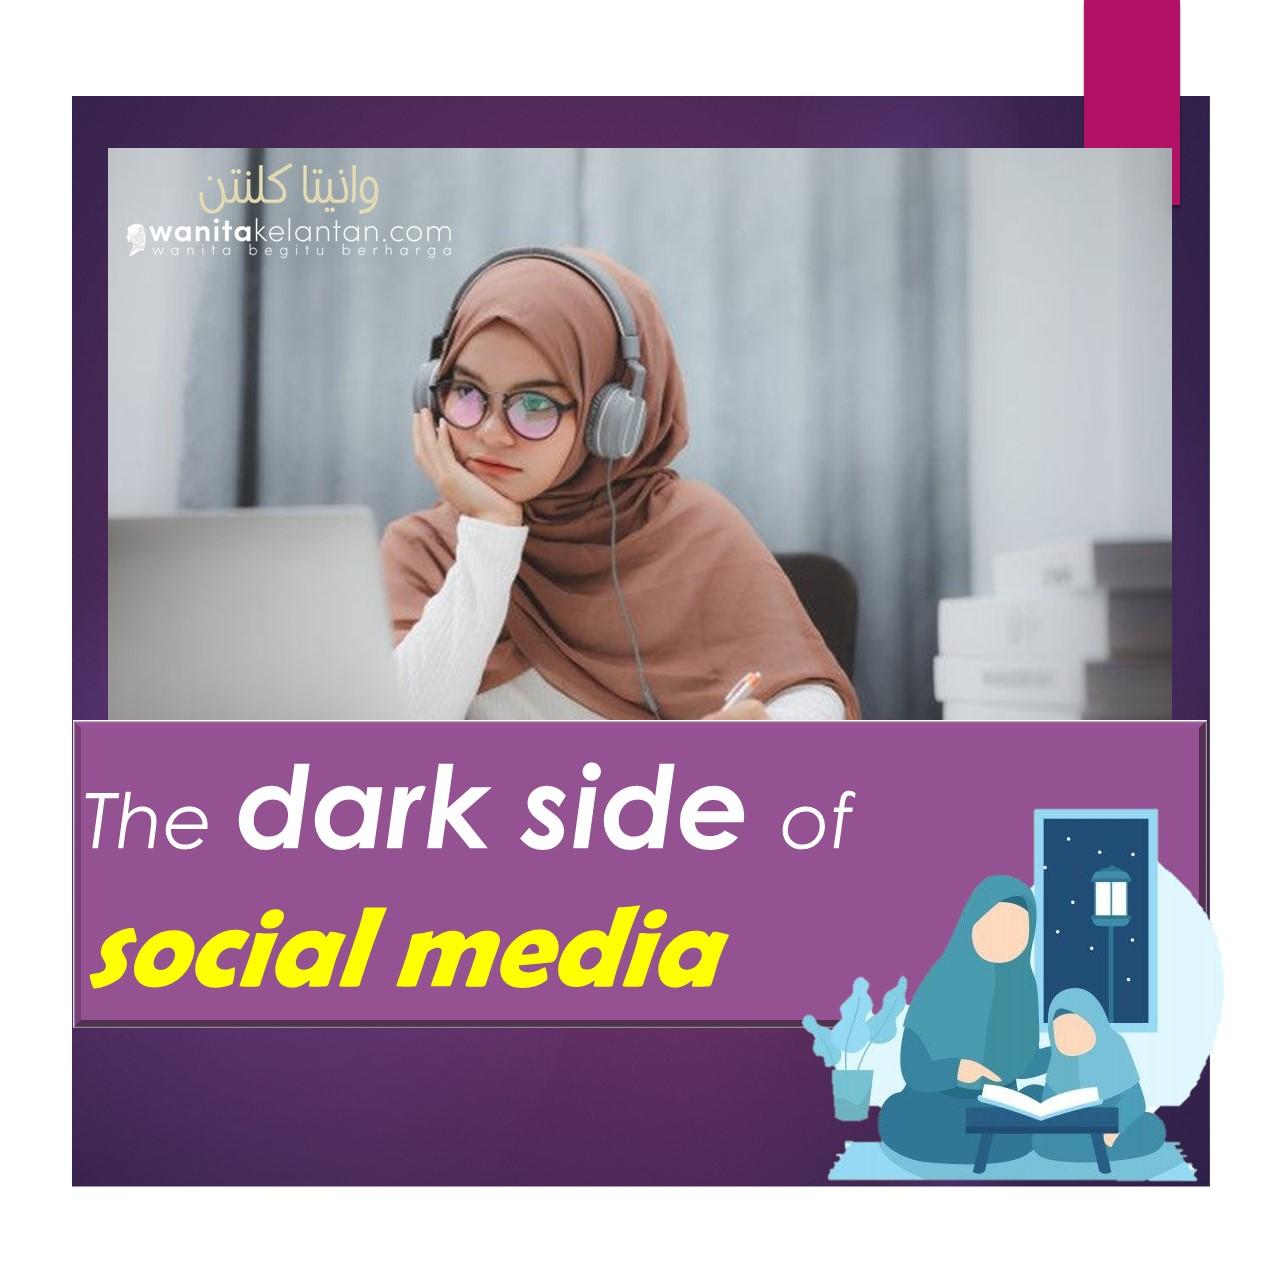 The Dark Side Of Social Media Artikel 25 Jan 2021 Feature Image